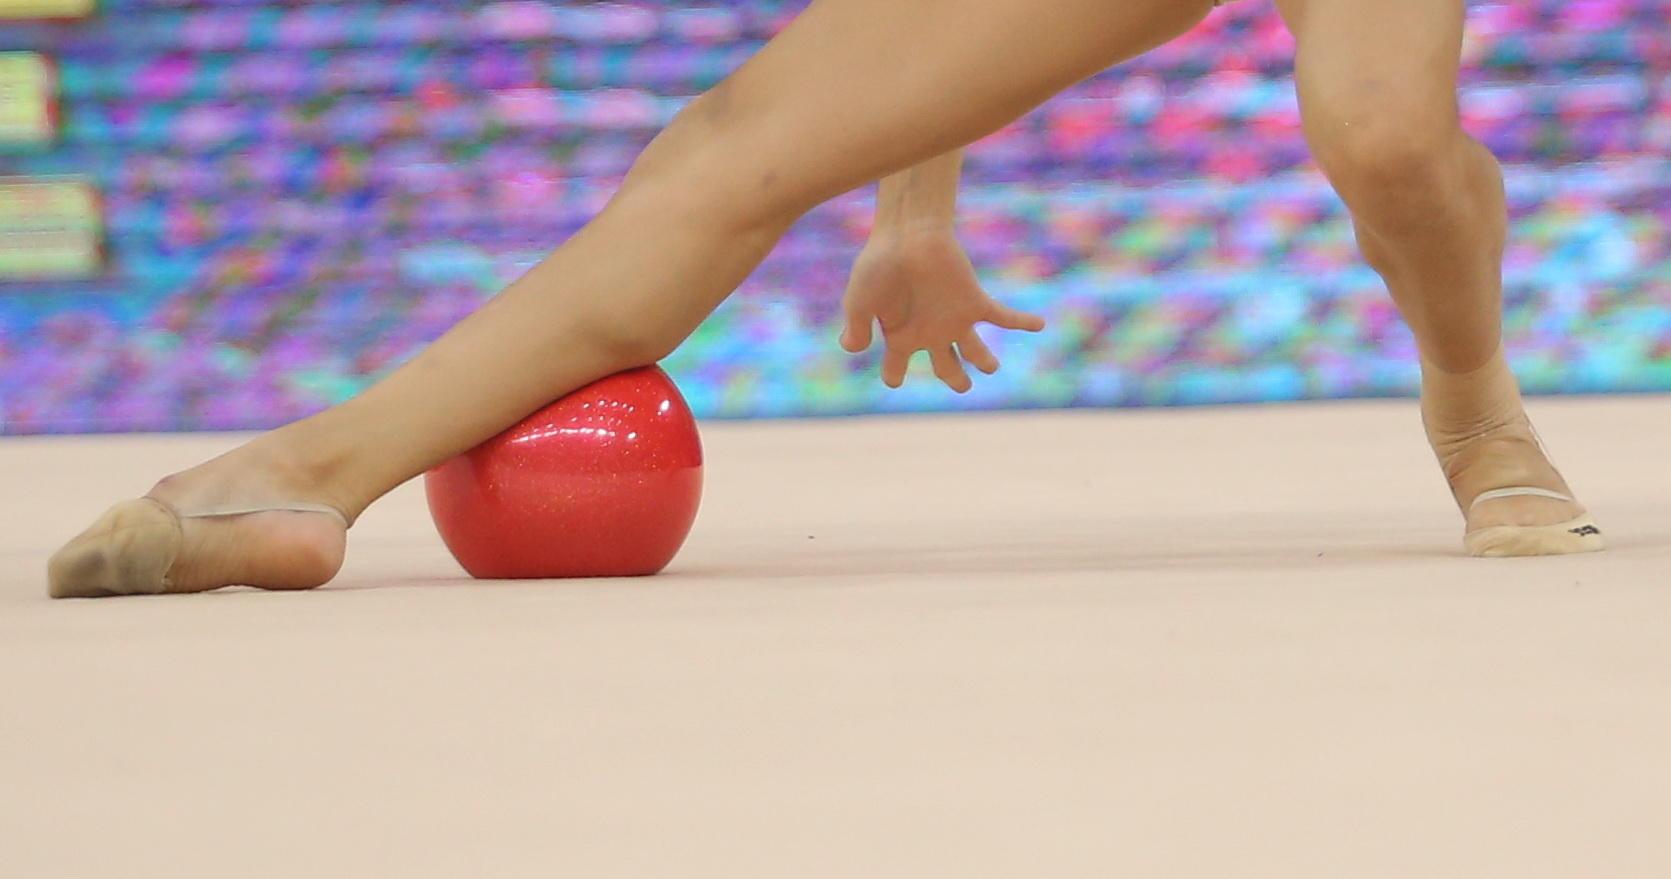 Dina Averina 1-st in ball exercises at Rhythmic Gymnastics World Championships in Baku